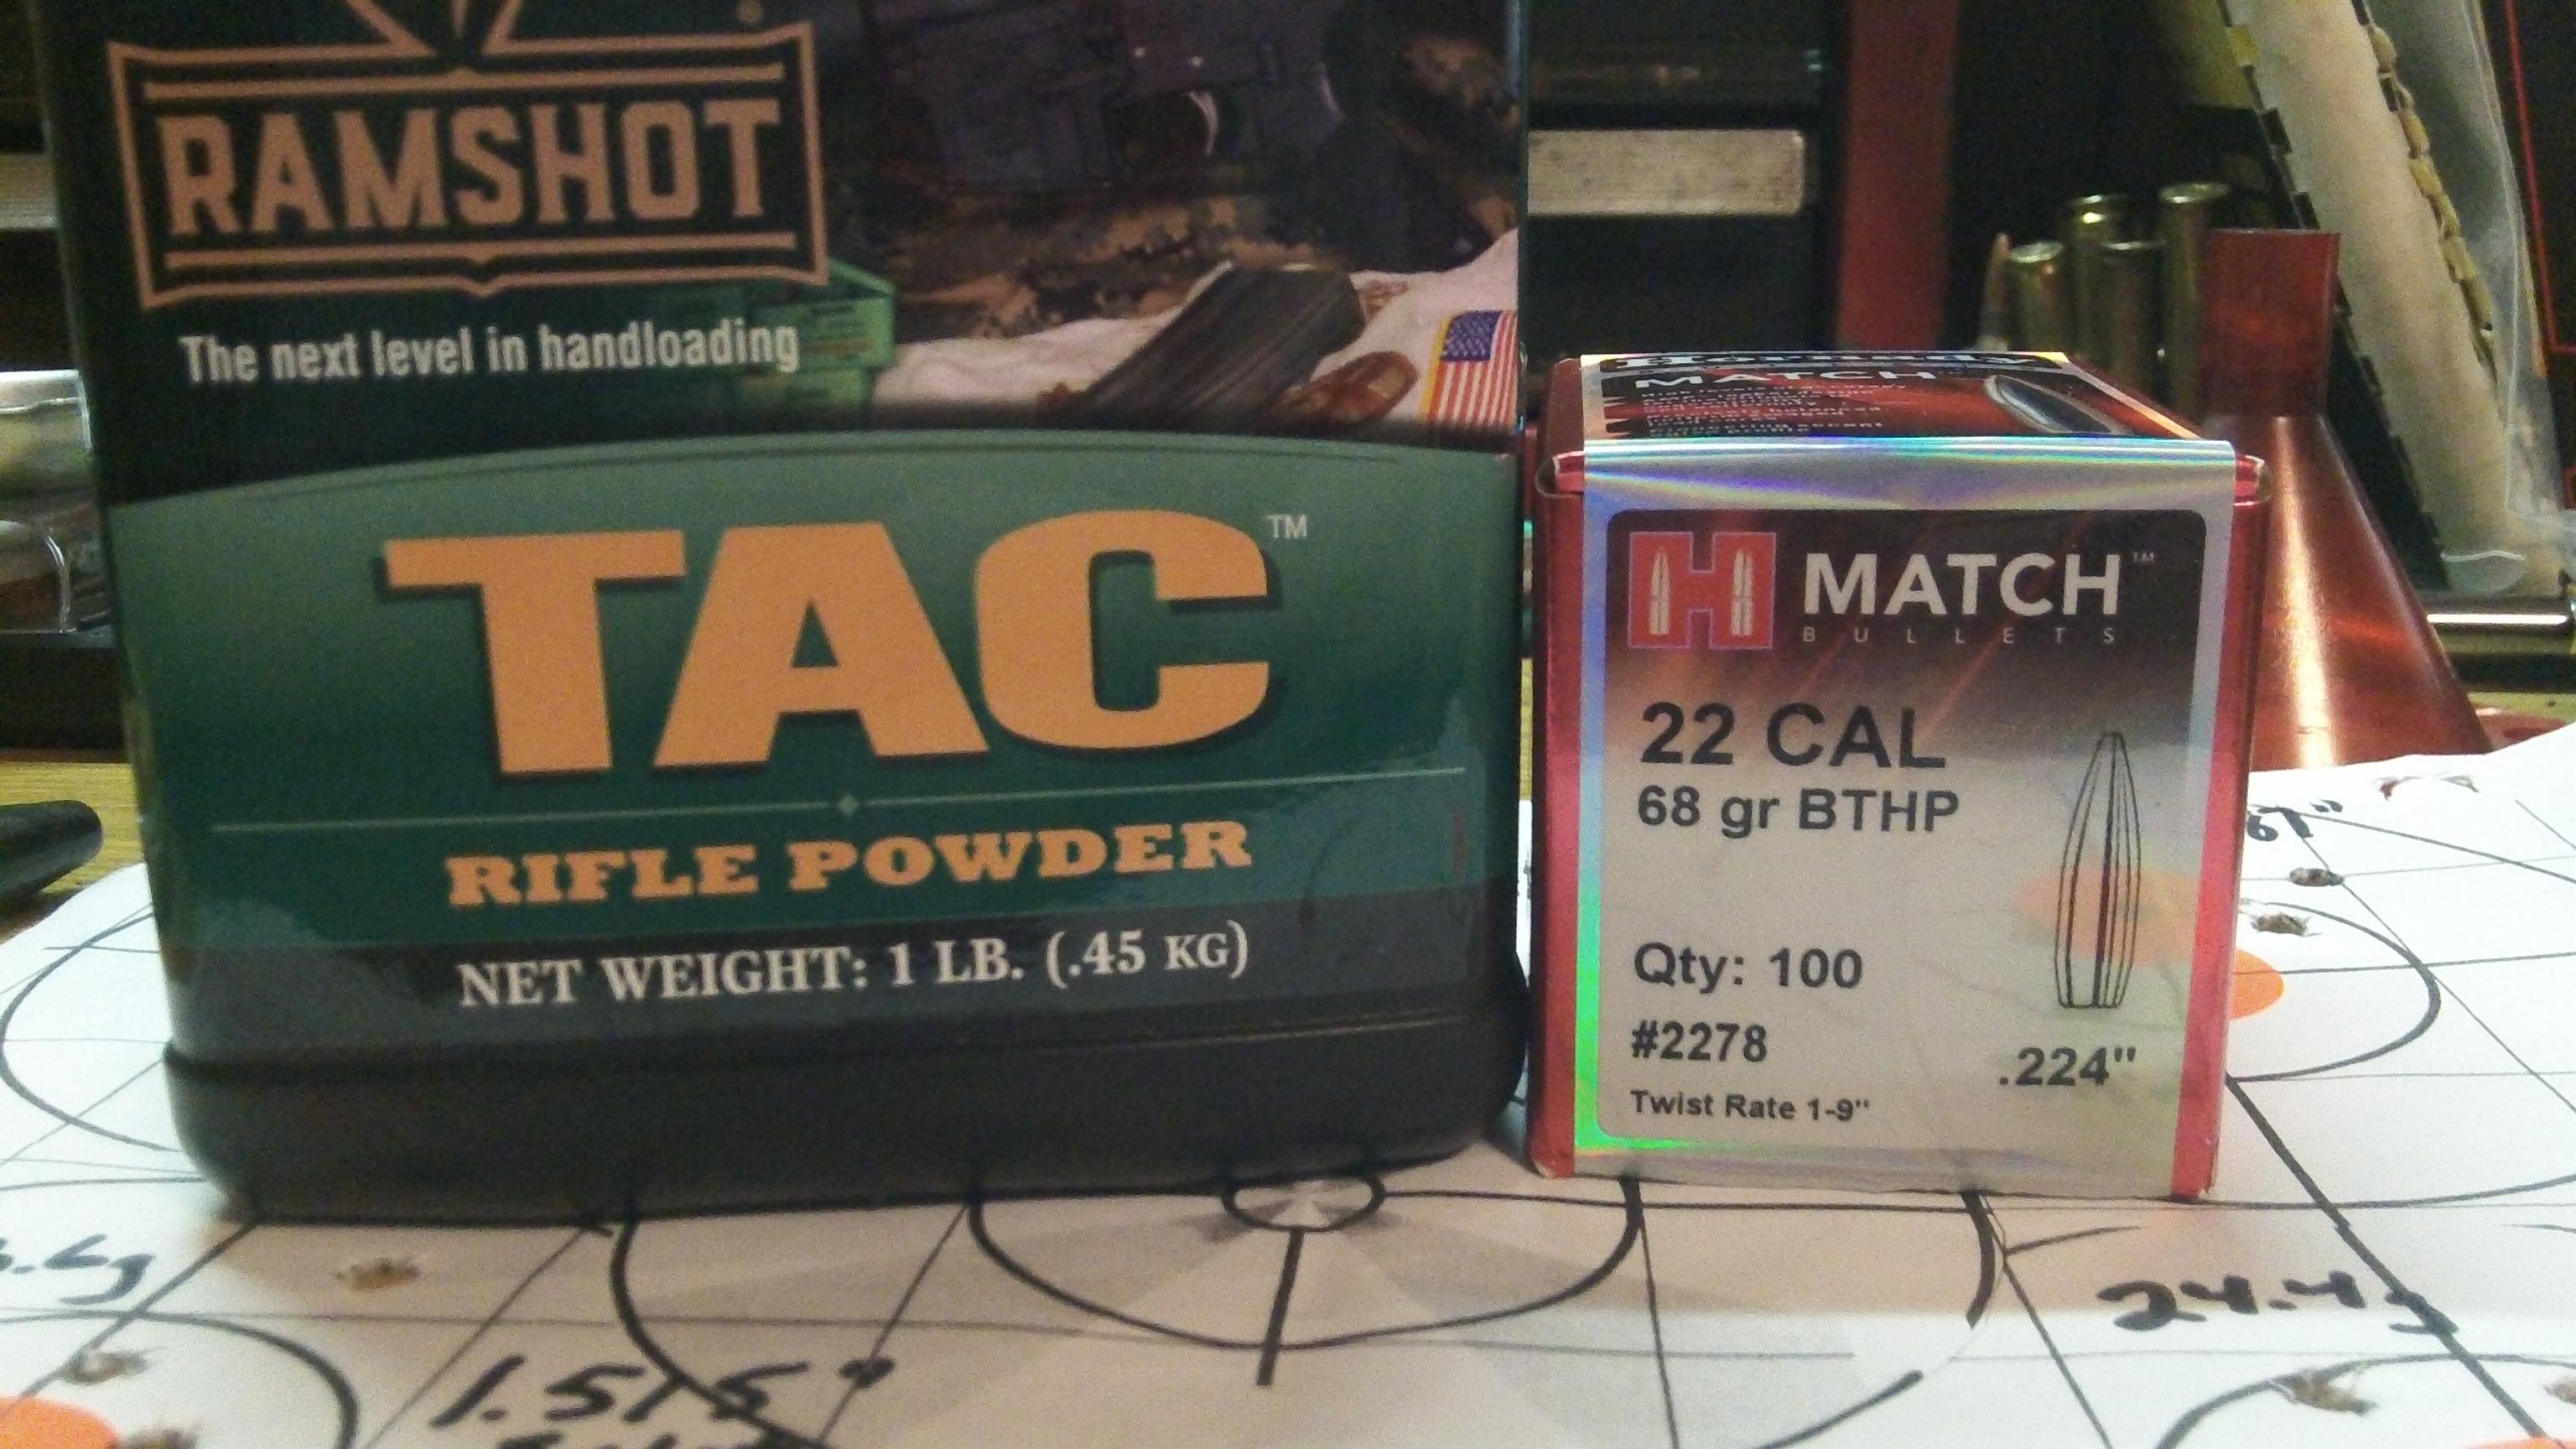 223 Rem; Ramshot TAC and Hornady 68g BTHP Match 1